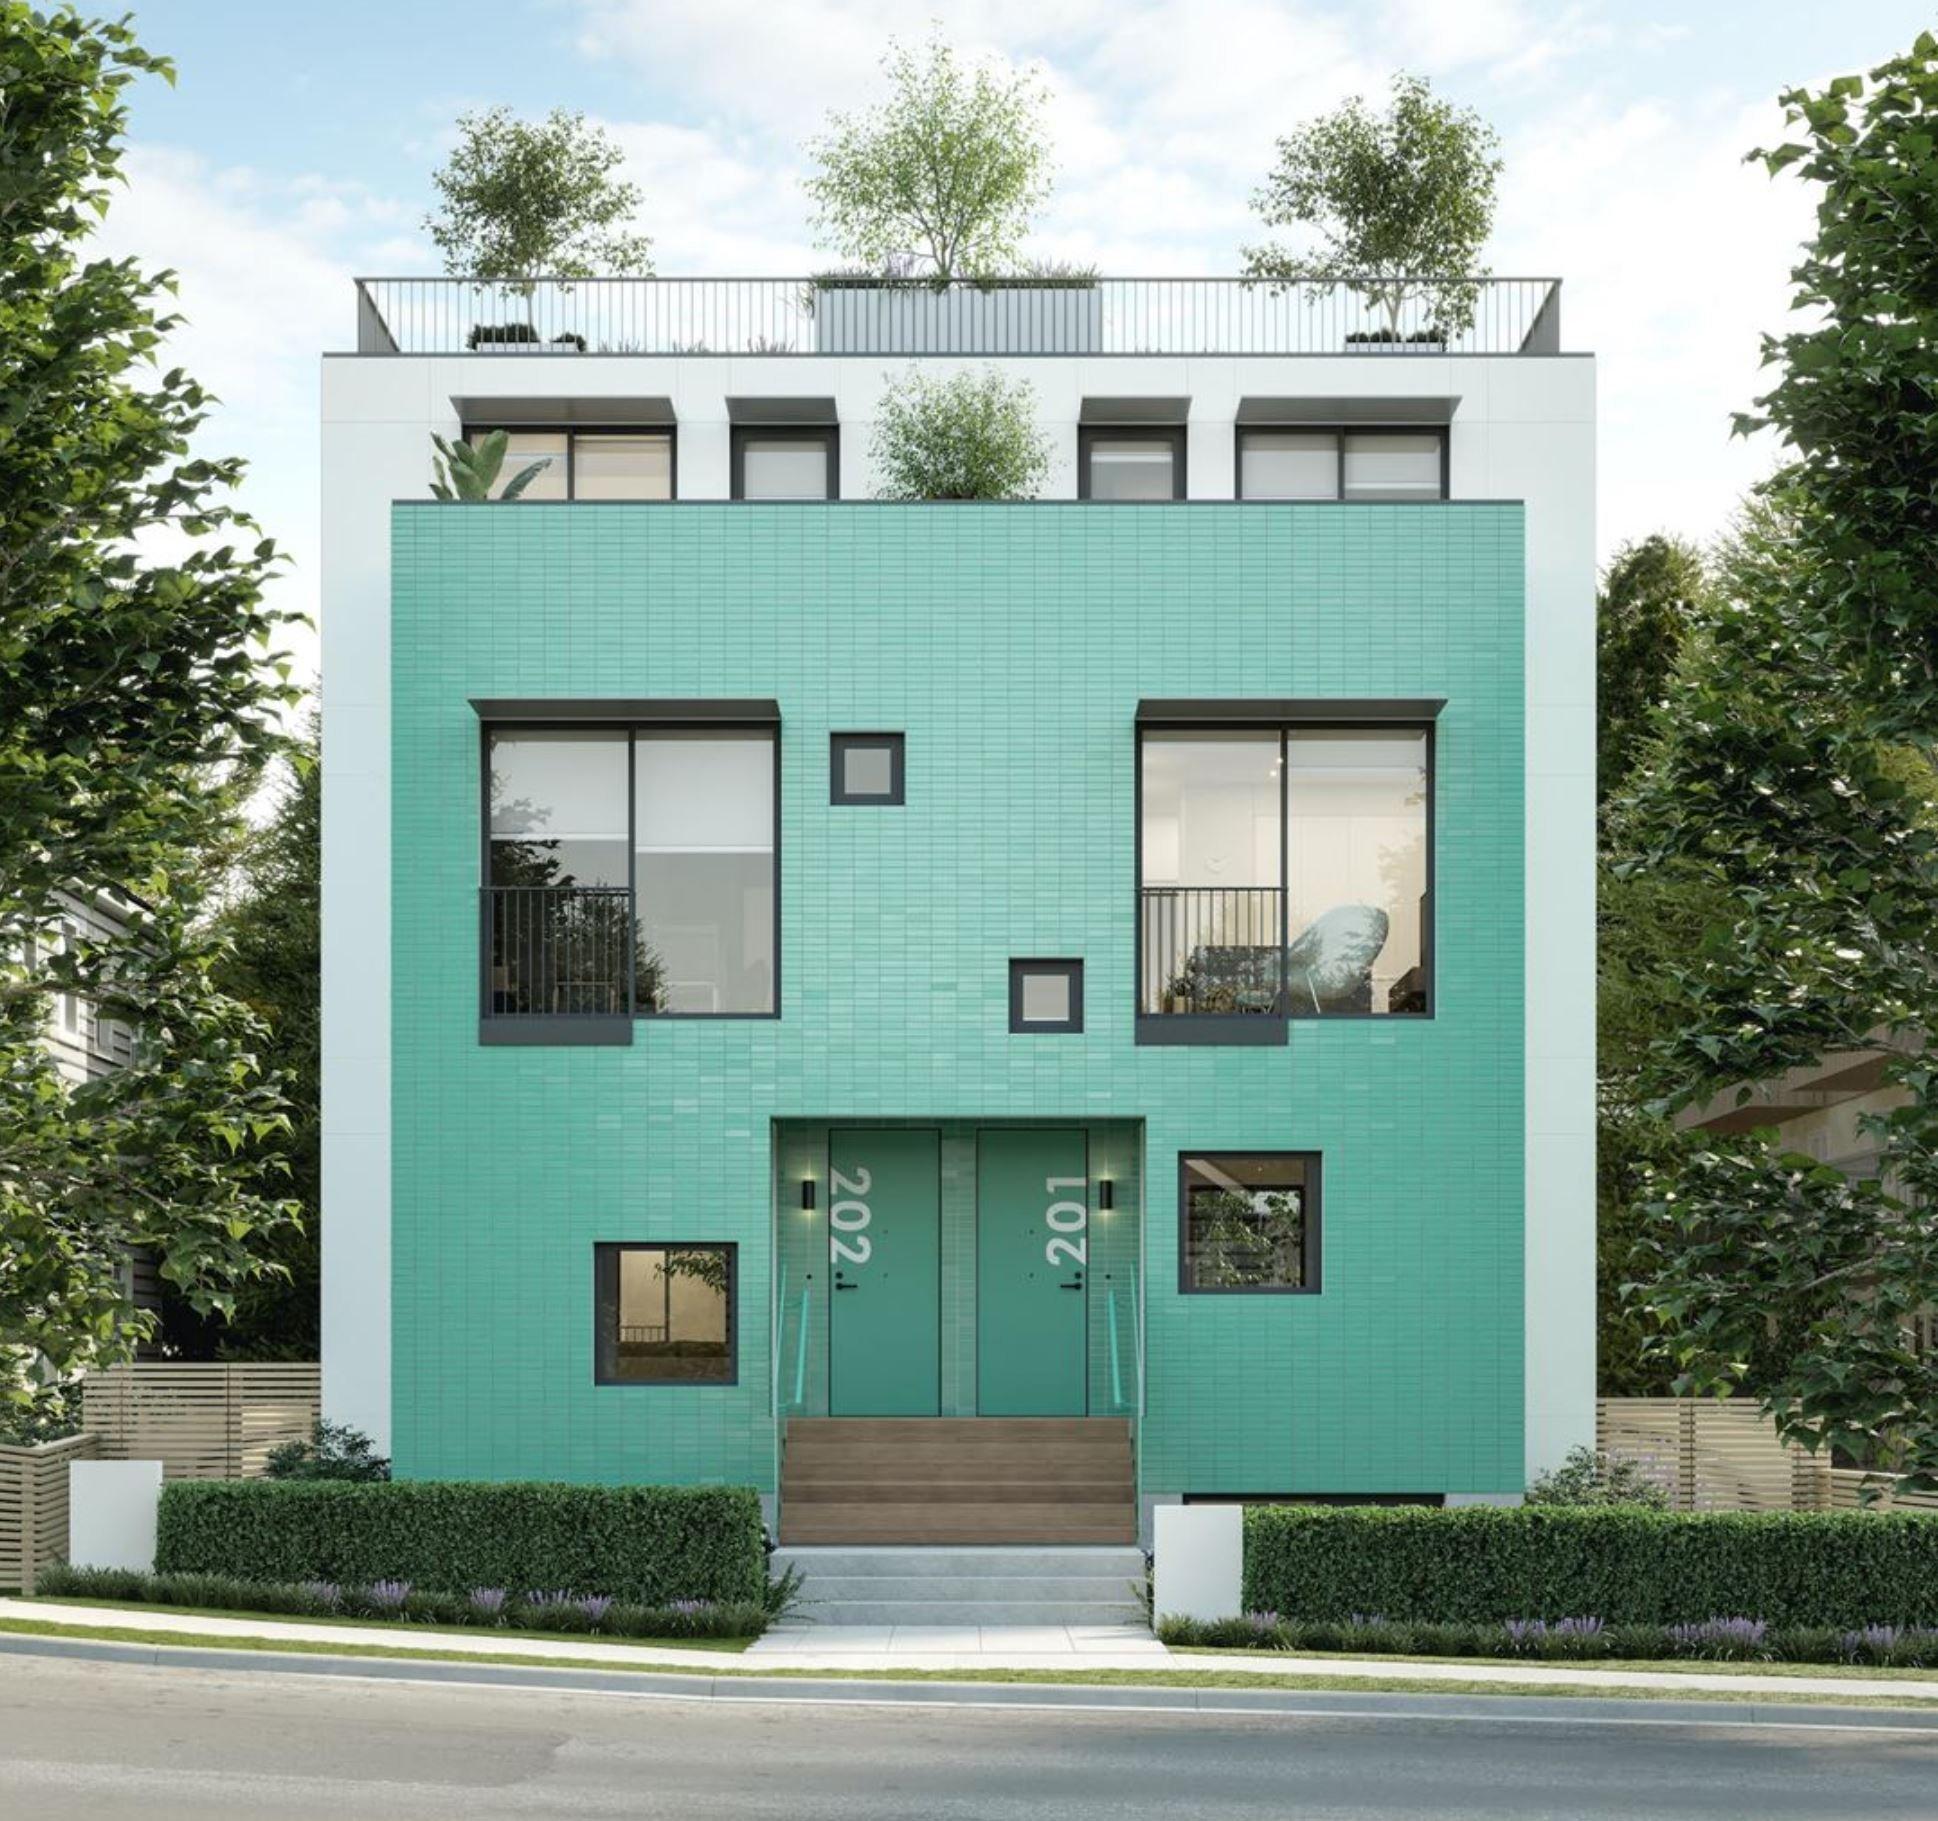 La Menta - 1658 East 5th Ave - South Street Development Group !